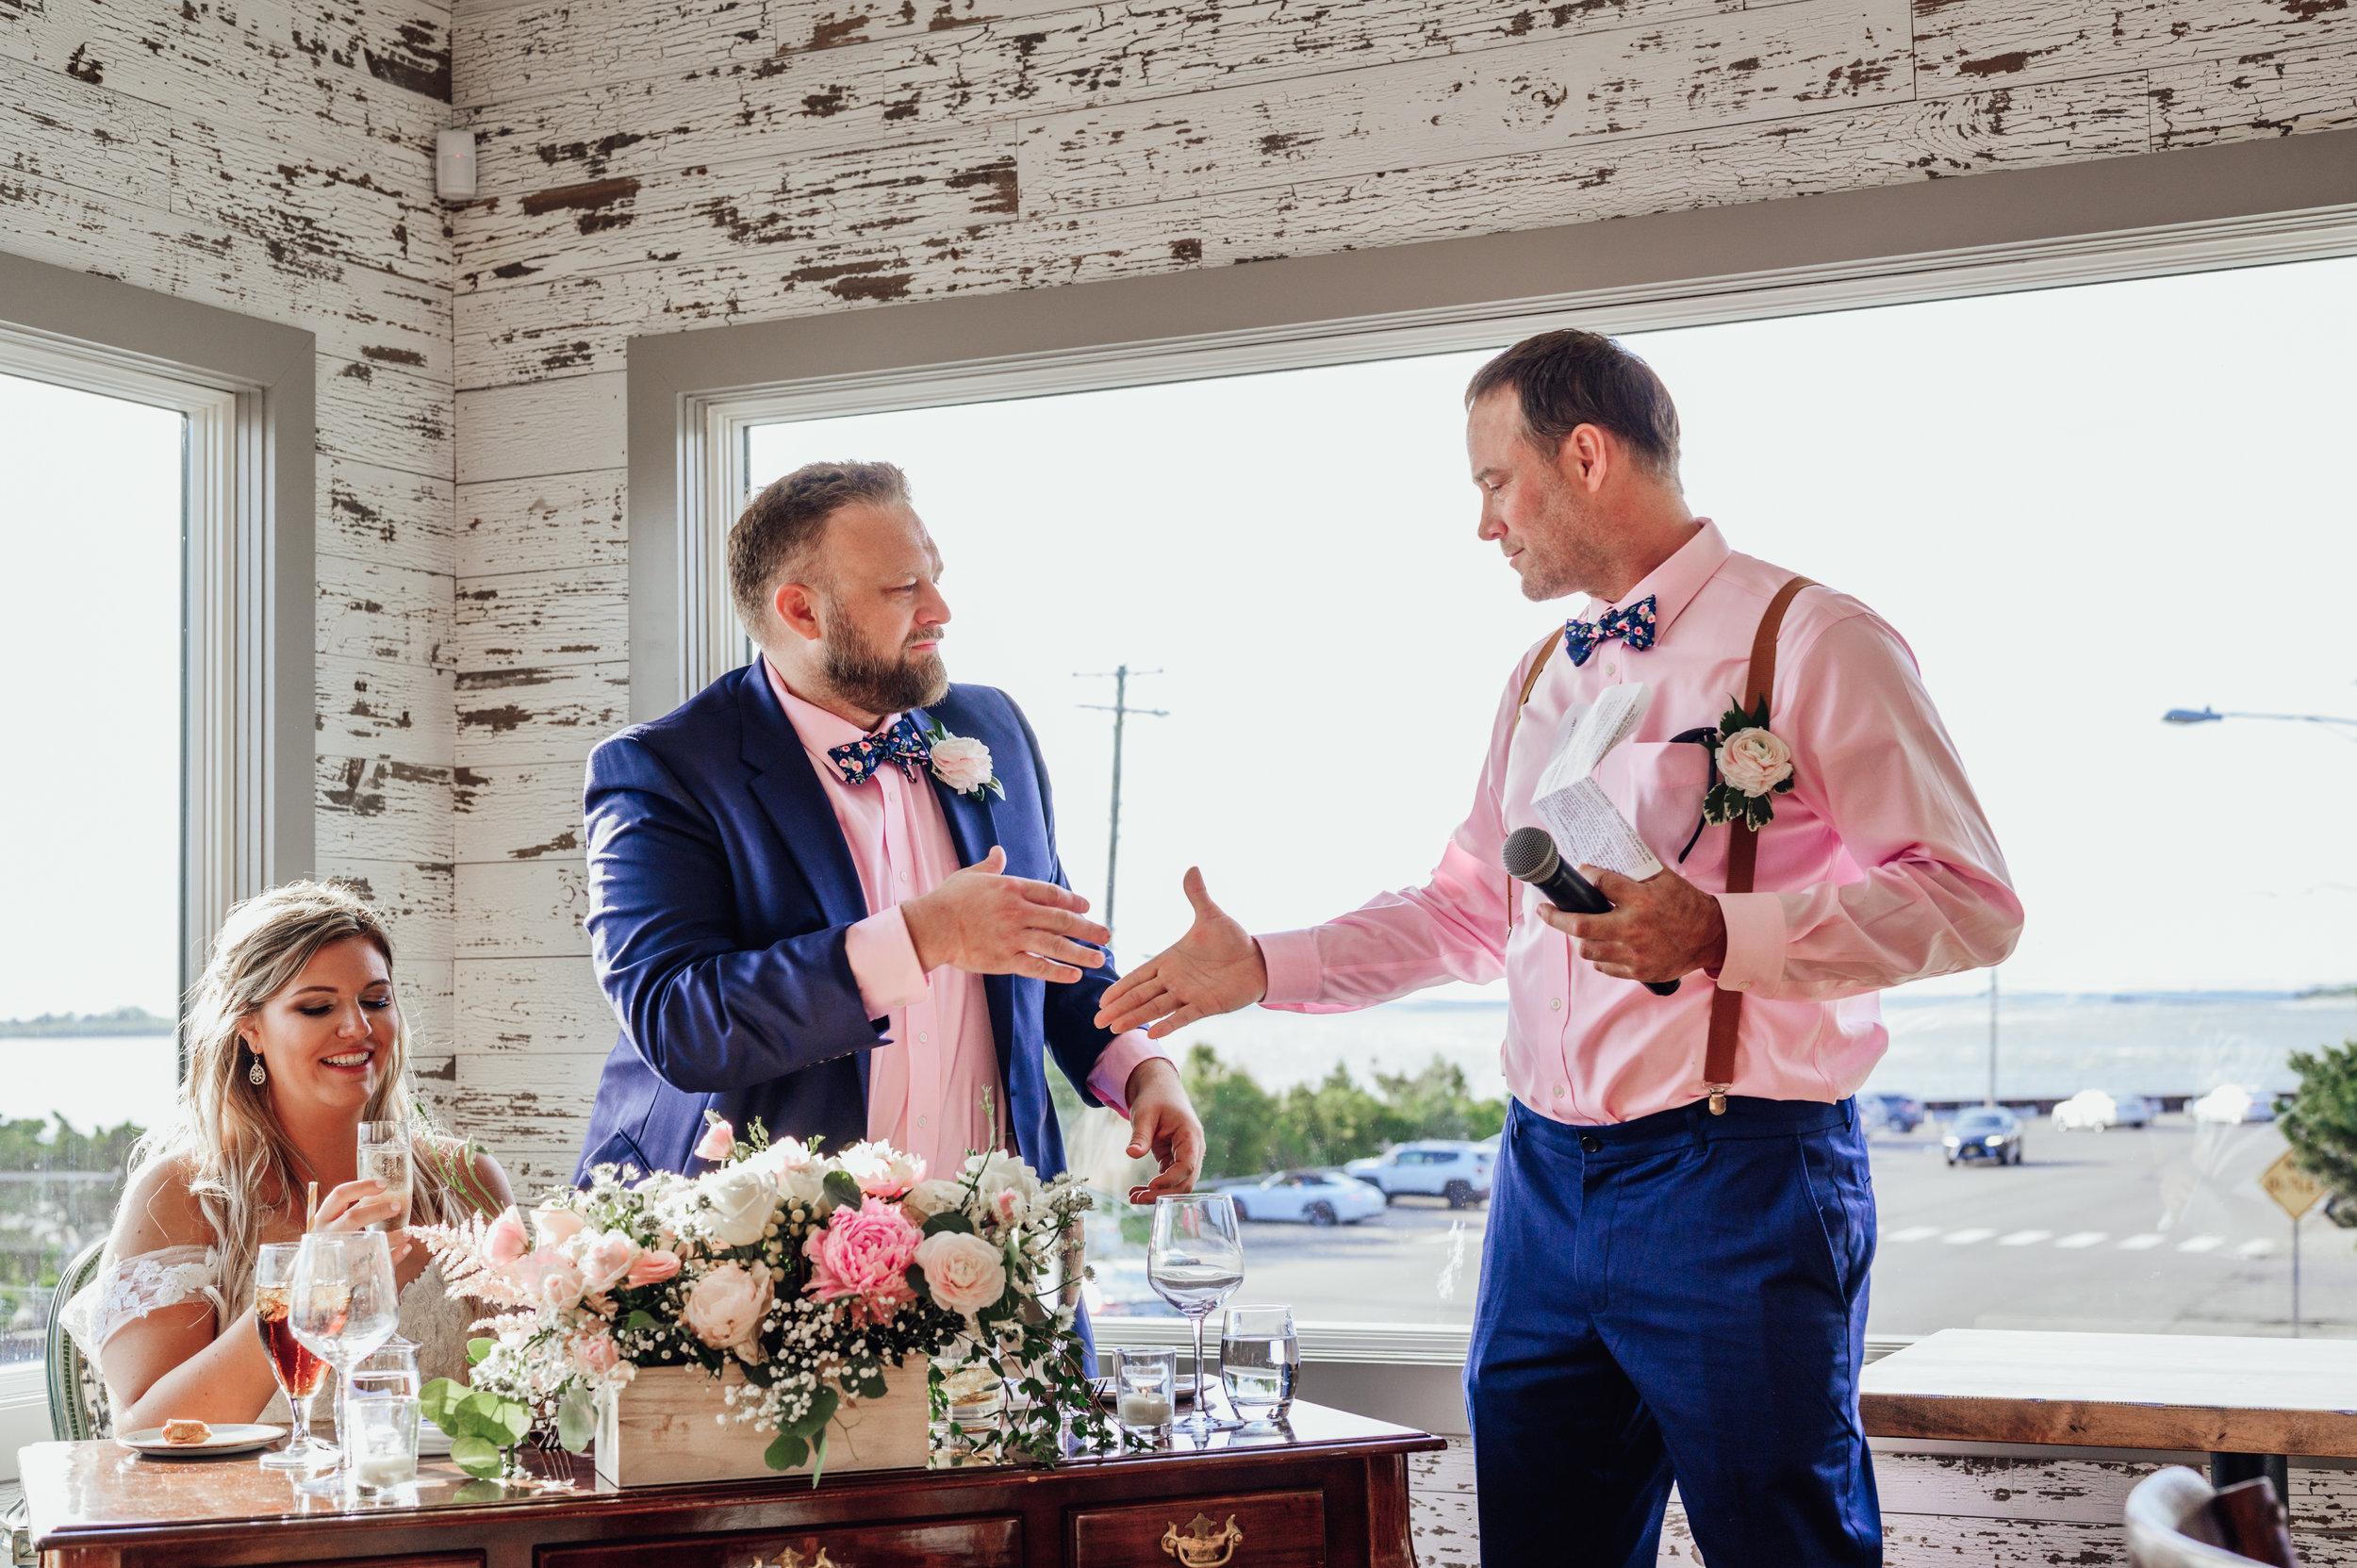 New Jersey Wedding Photographer, Felsberg Photography LBI wedding photography 106.jpg